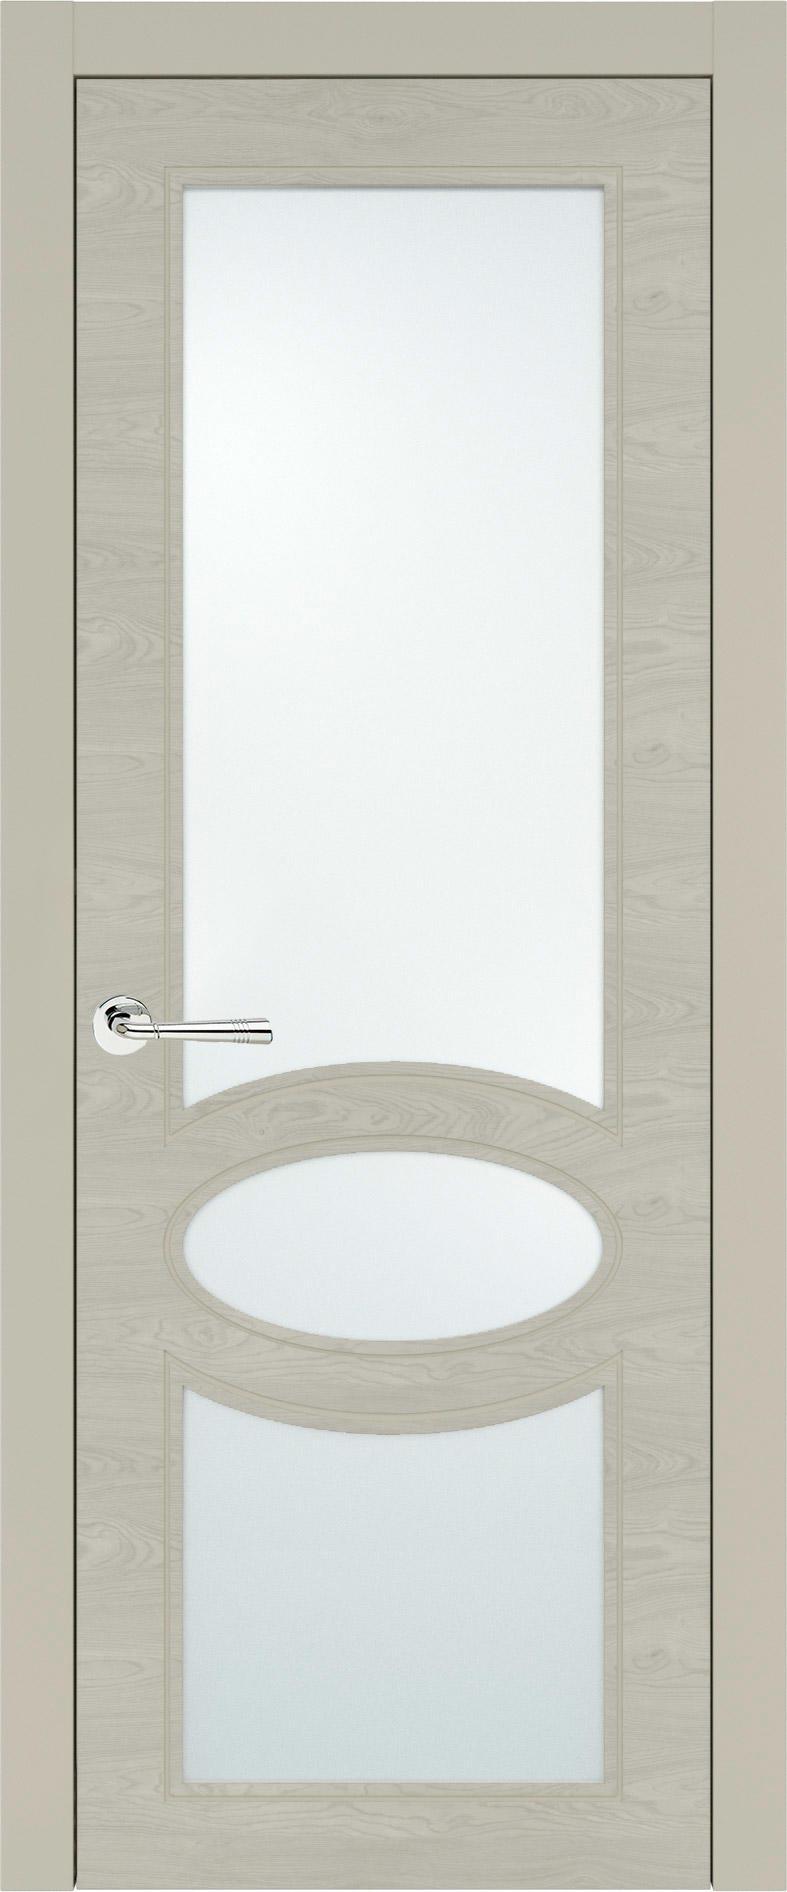 Florencia Neo Classic цвет - Серо-оливковая эмаль по шпону (RAL 7032) Со стеклом (ДО)